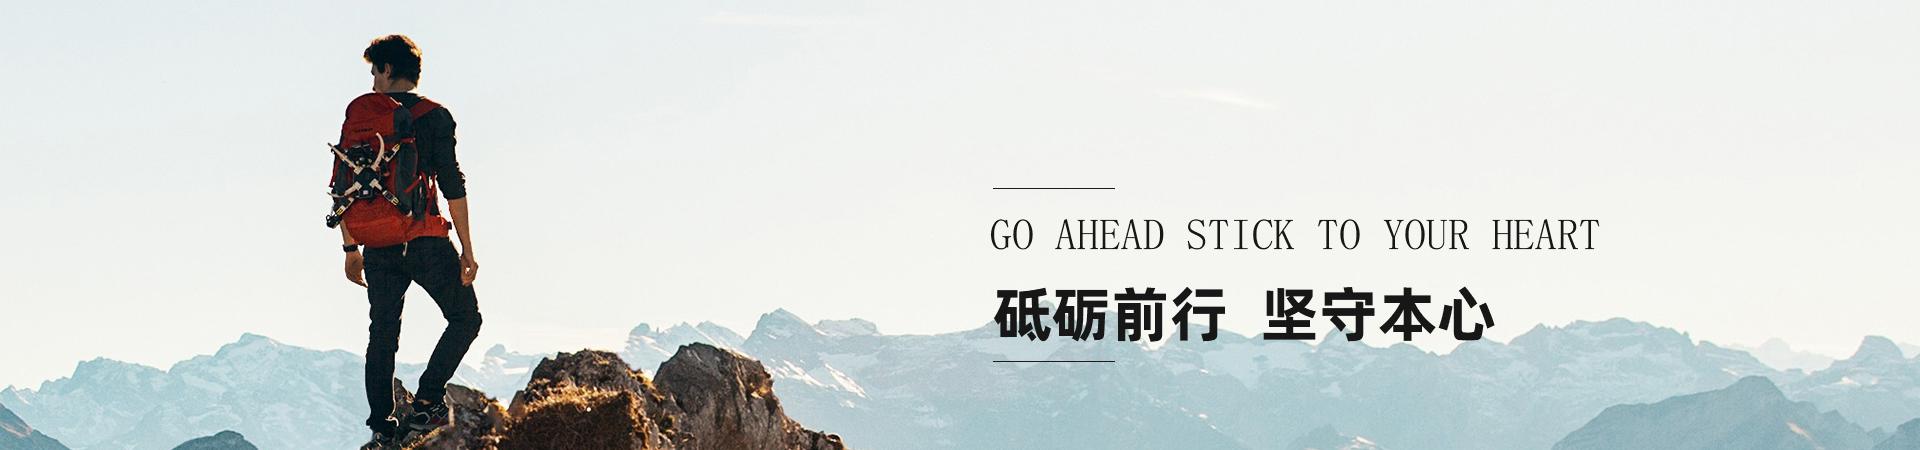 http://www.tsgwaq.cn/data/upload/202005/20200514115223_400.jpg